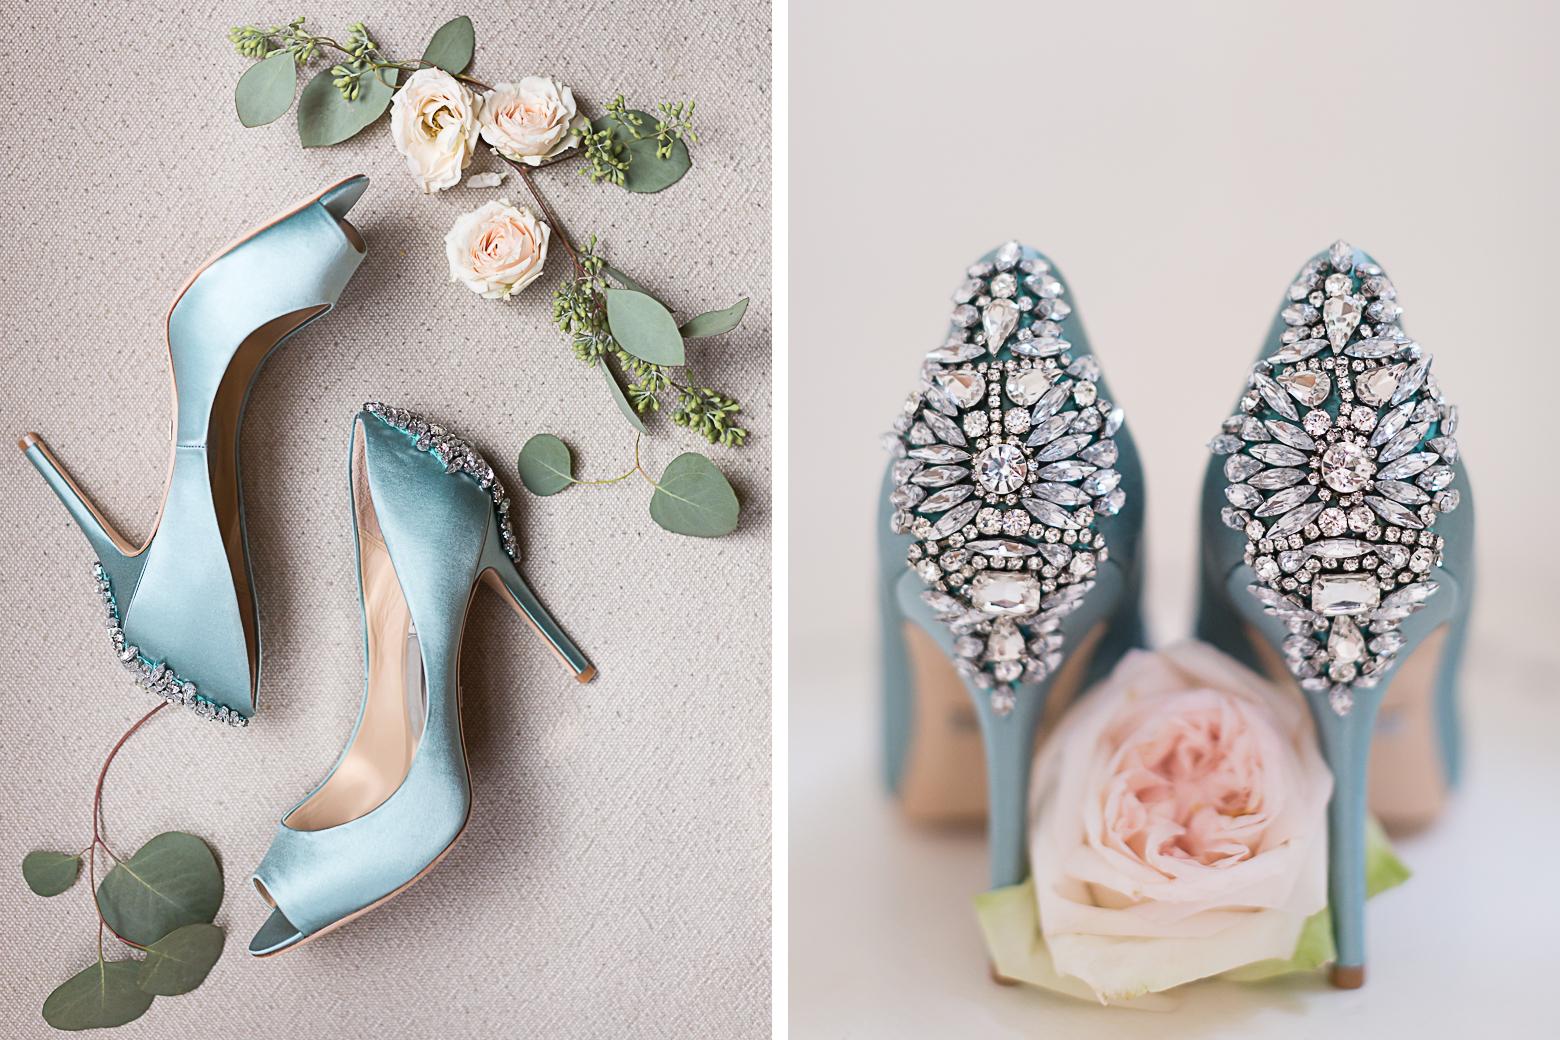 badgley-mischka-wedding-blue-shoes.jpg